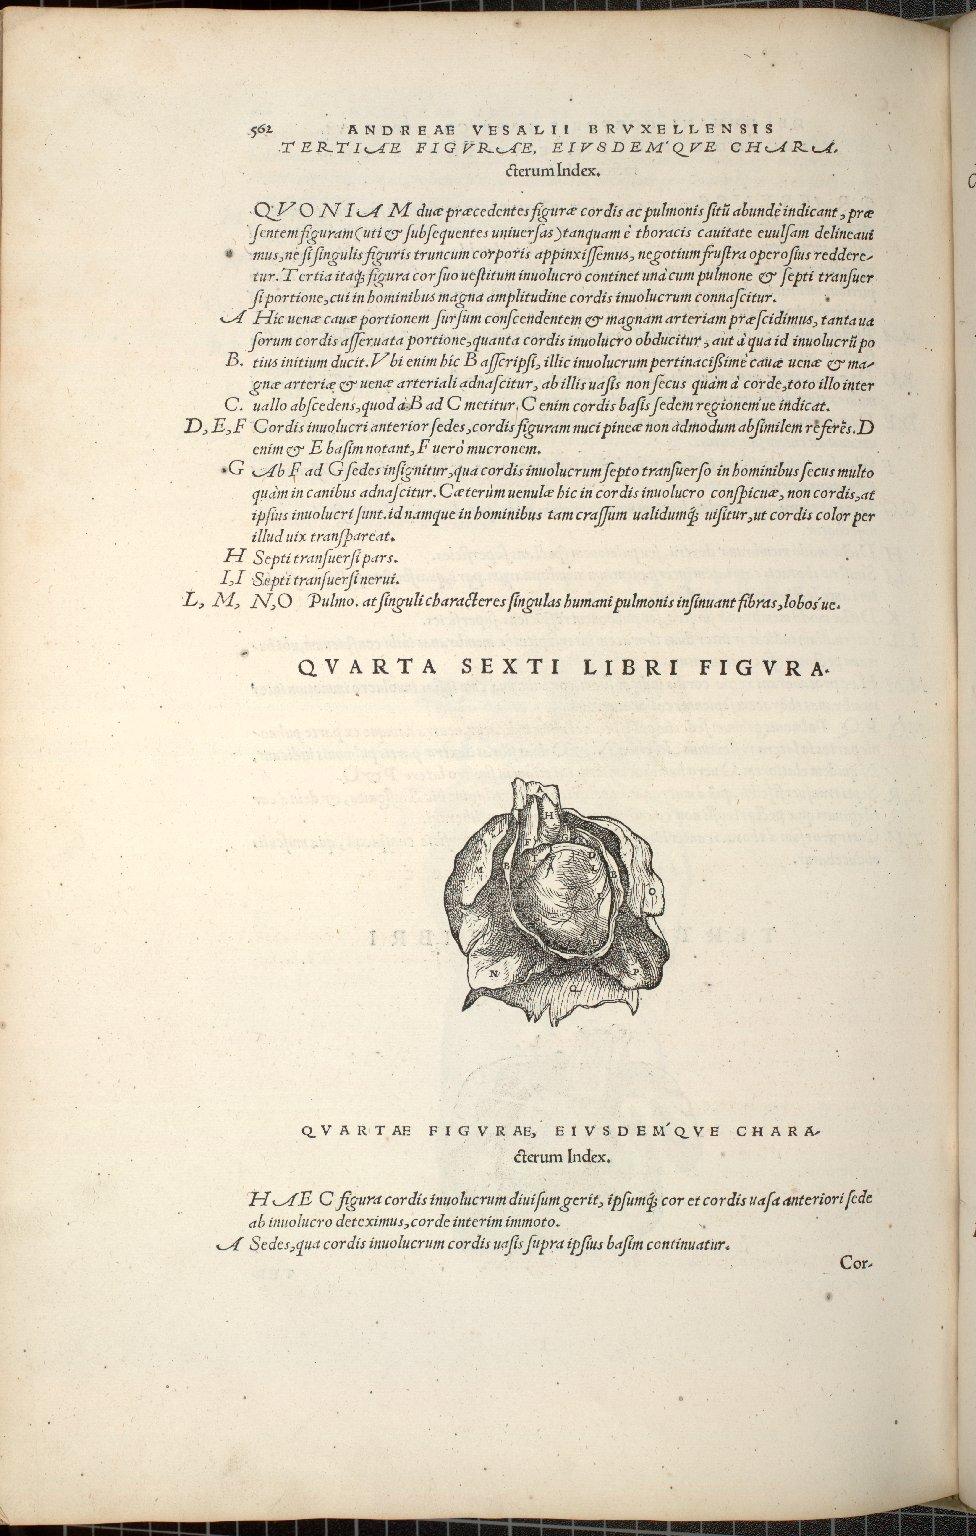 Quarta Sexti Libri Figura.